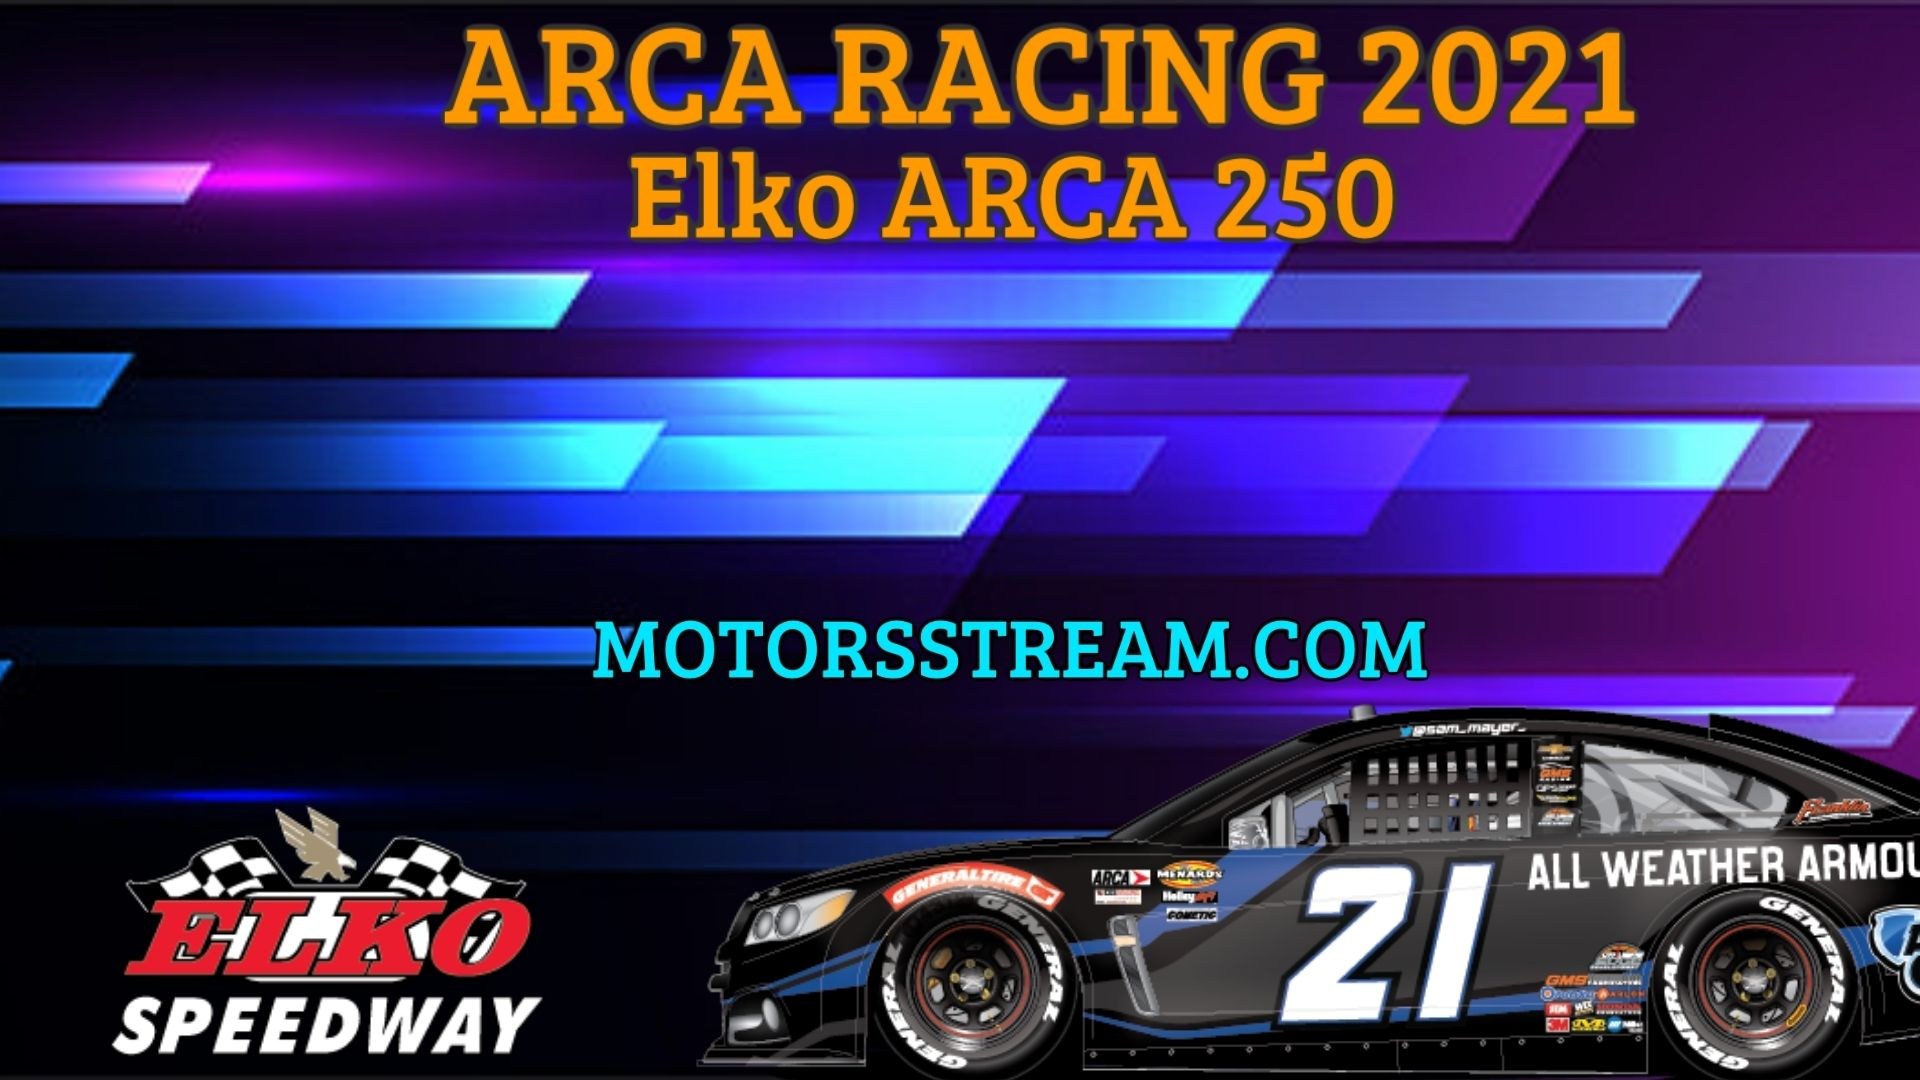 Elko ARCA 250 Live Stream 2021 Arca Racing